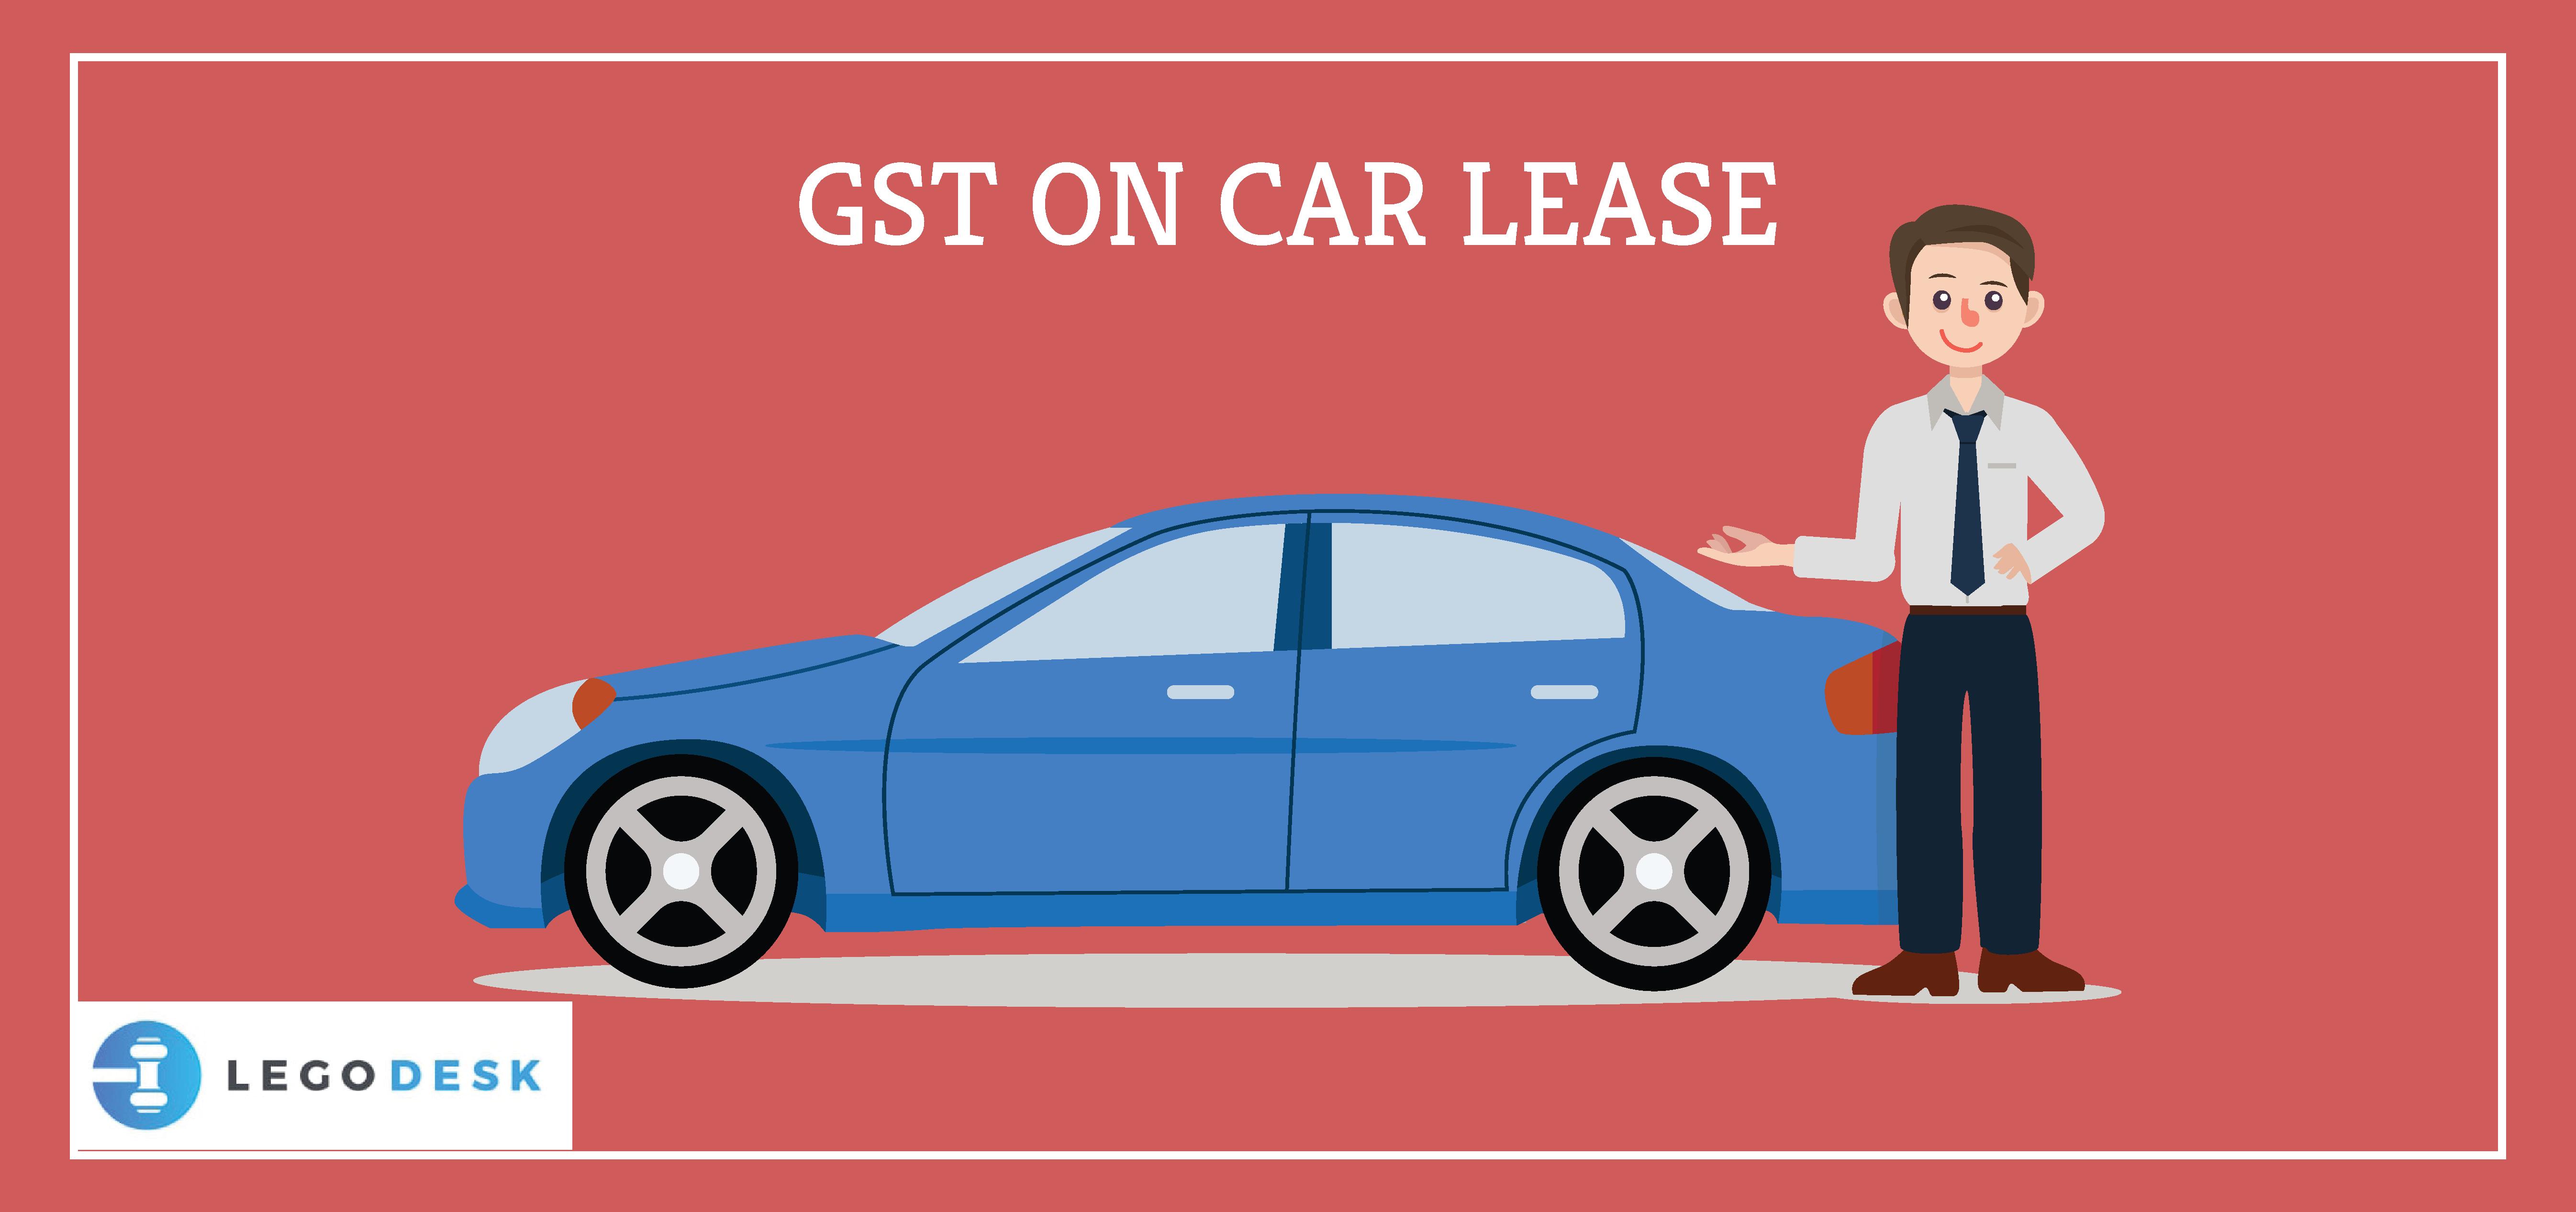 GST on Car Lease